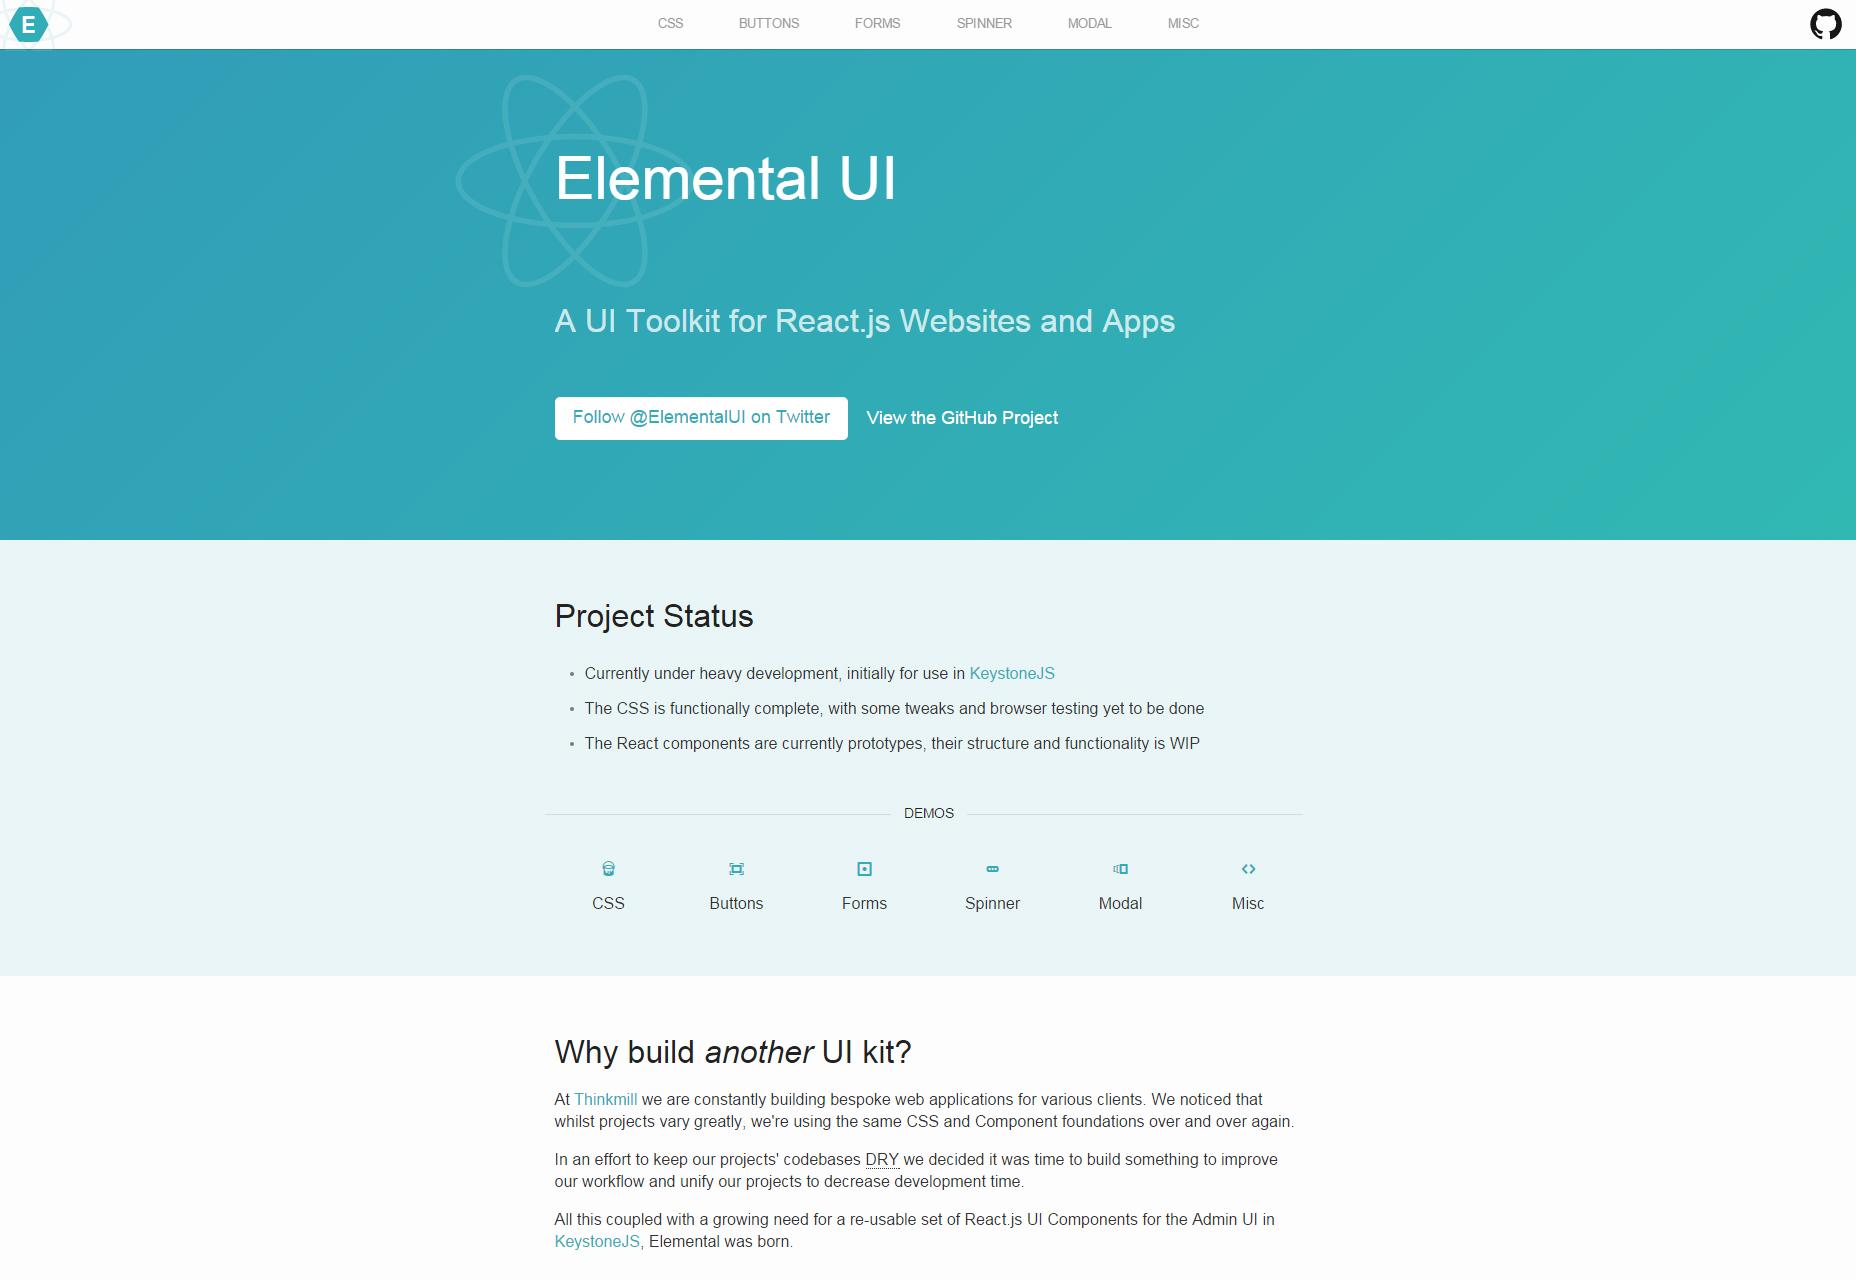 elemental-reactjs-focused-ui-toolkit